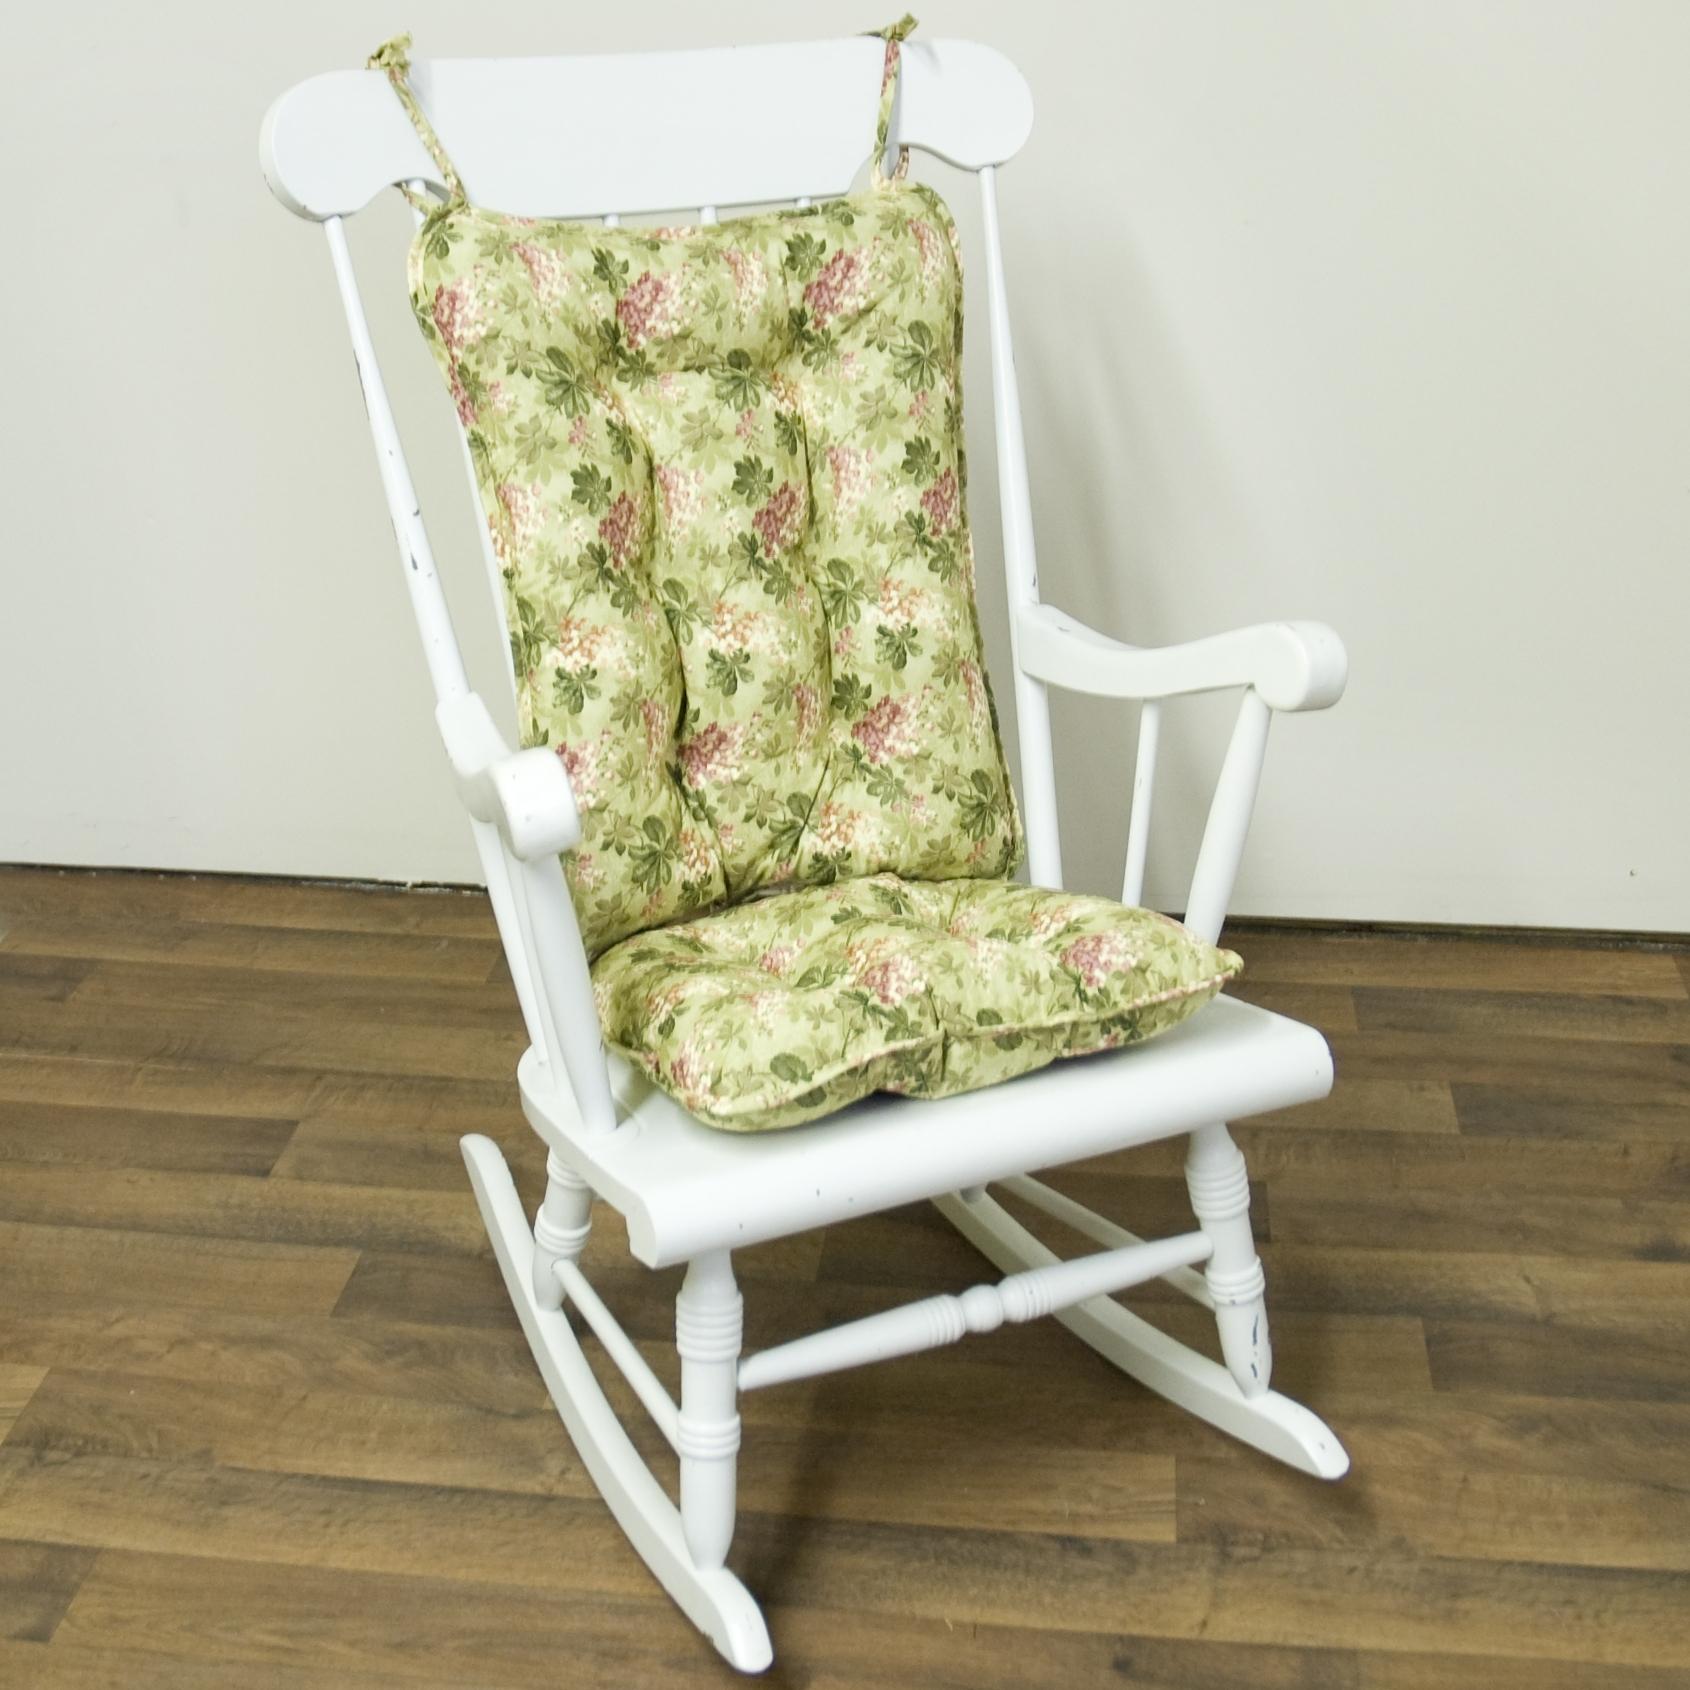 Rocking Chair Cushions For Outdoor Regarding Best And Newest Outdoor Rocking Chair Cushions Flower : Beautiful Outdoor Rocking (View 10 of 15)